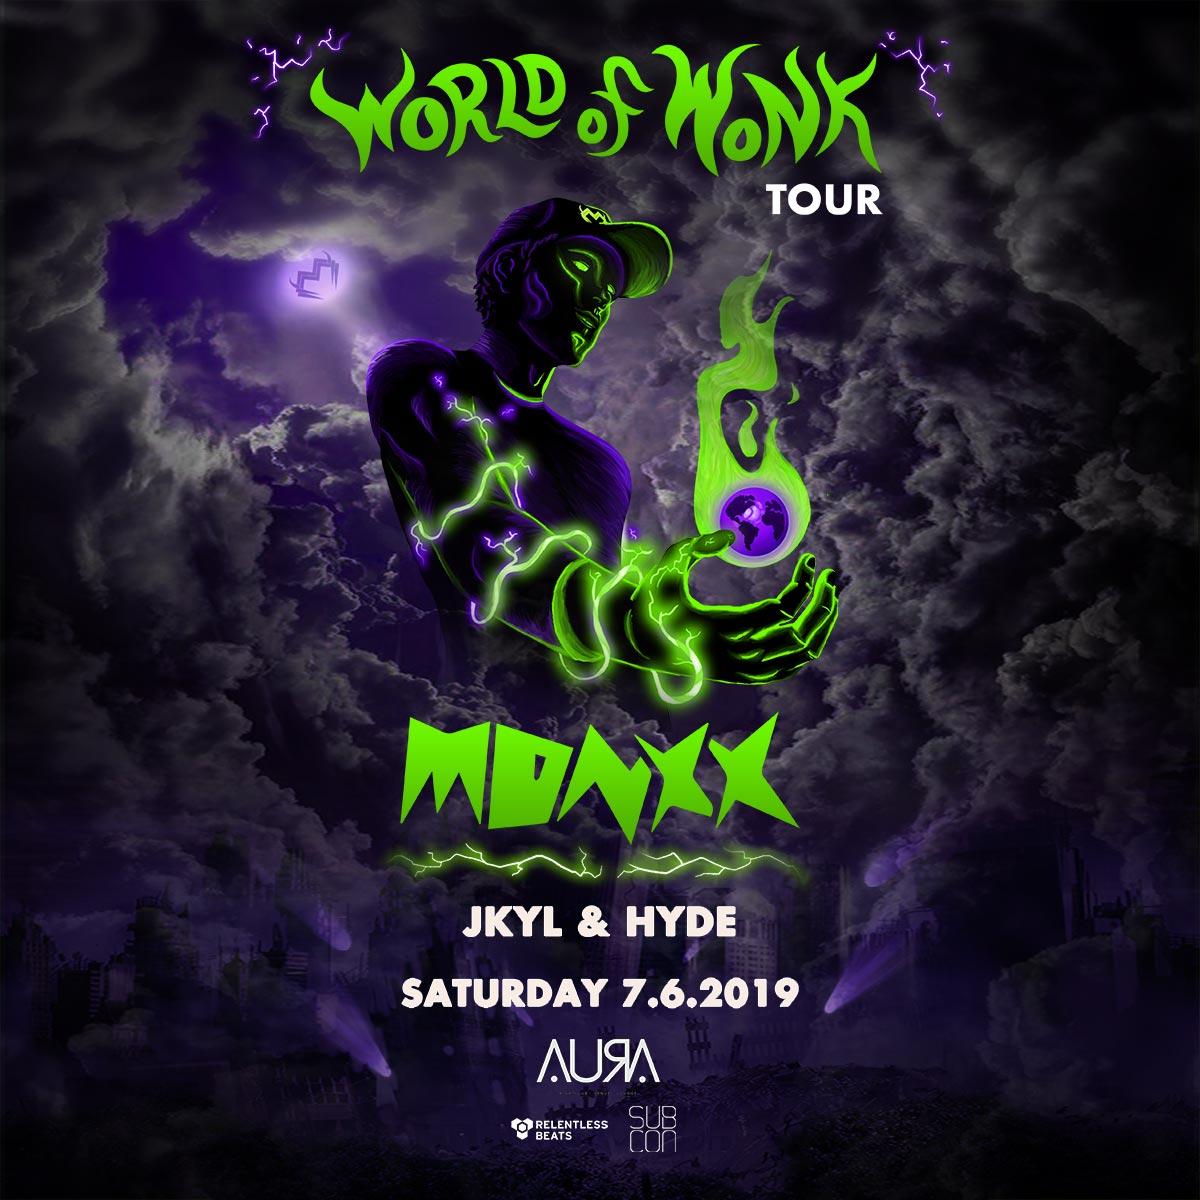 Flyer for Monxx